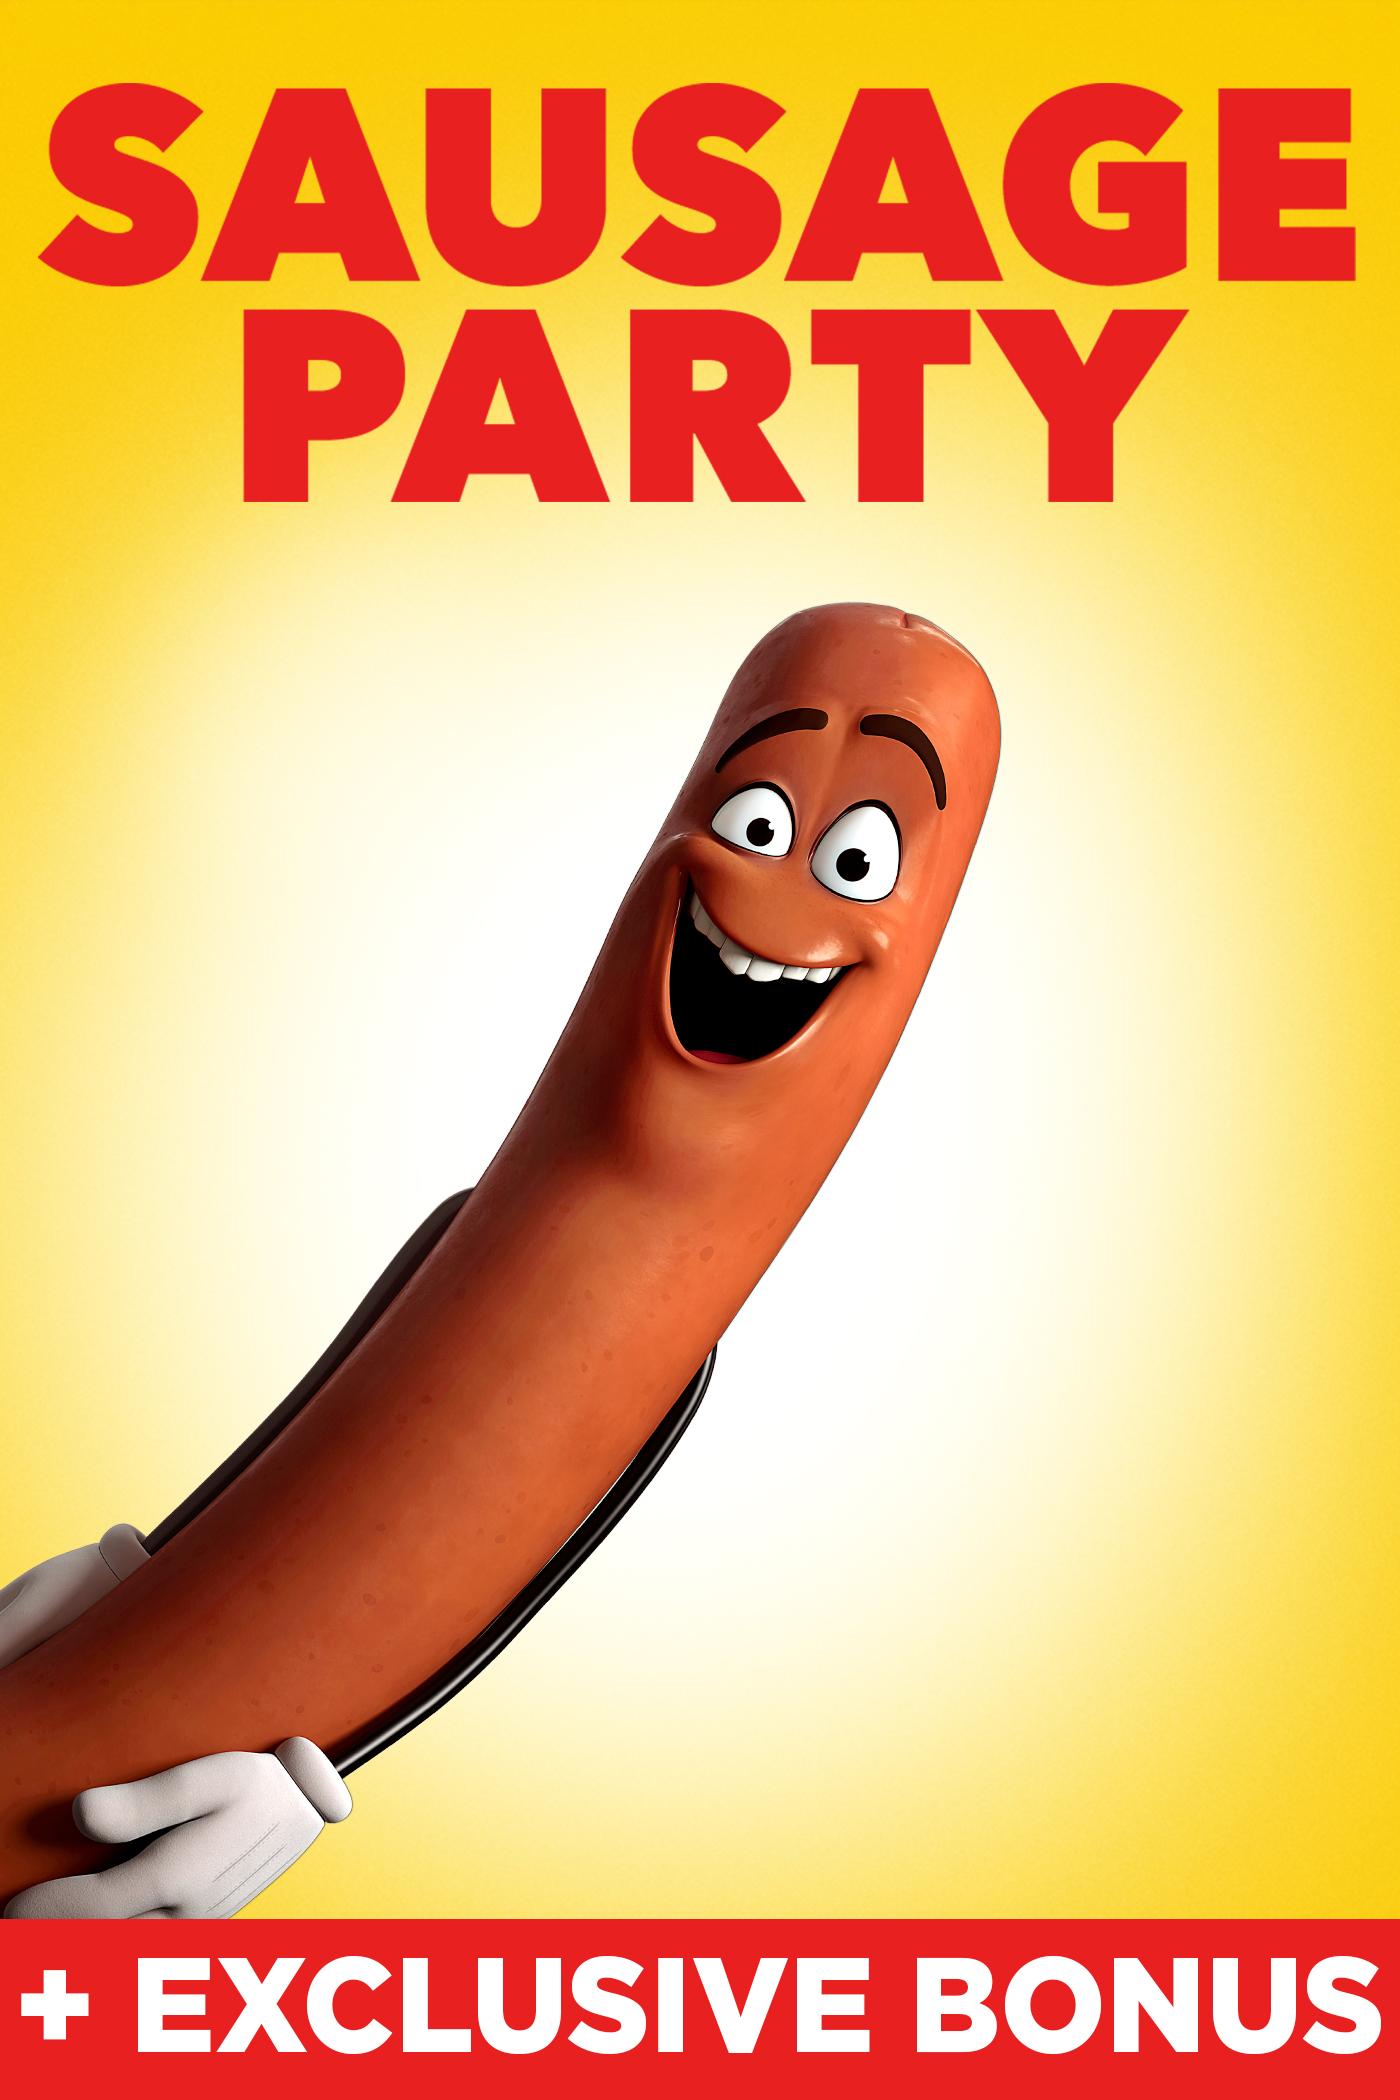 Sausage Party (+ Exclusive Bonus)